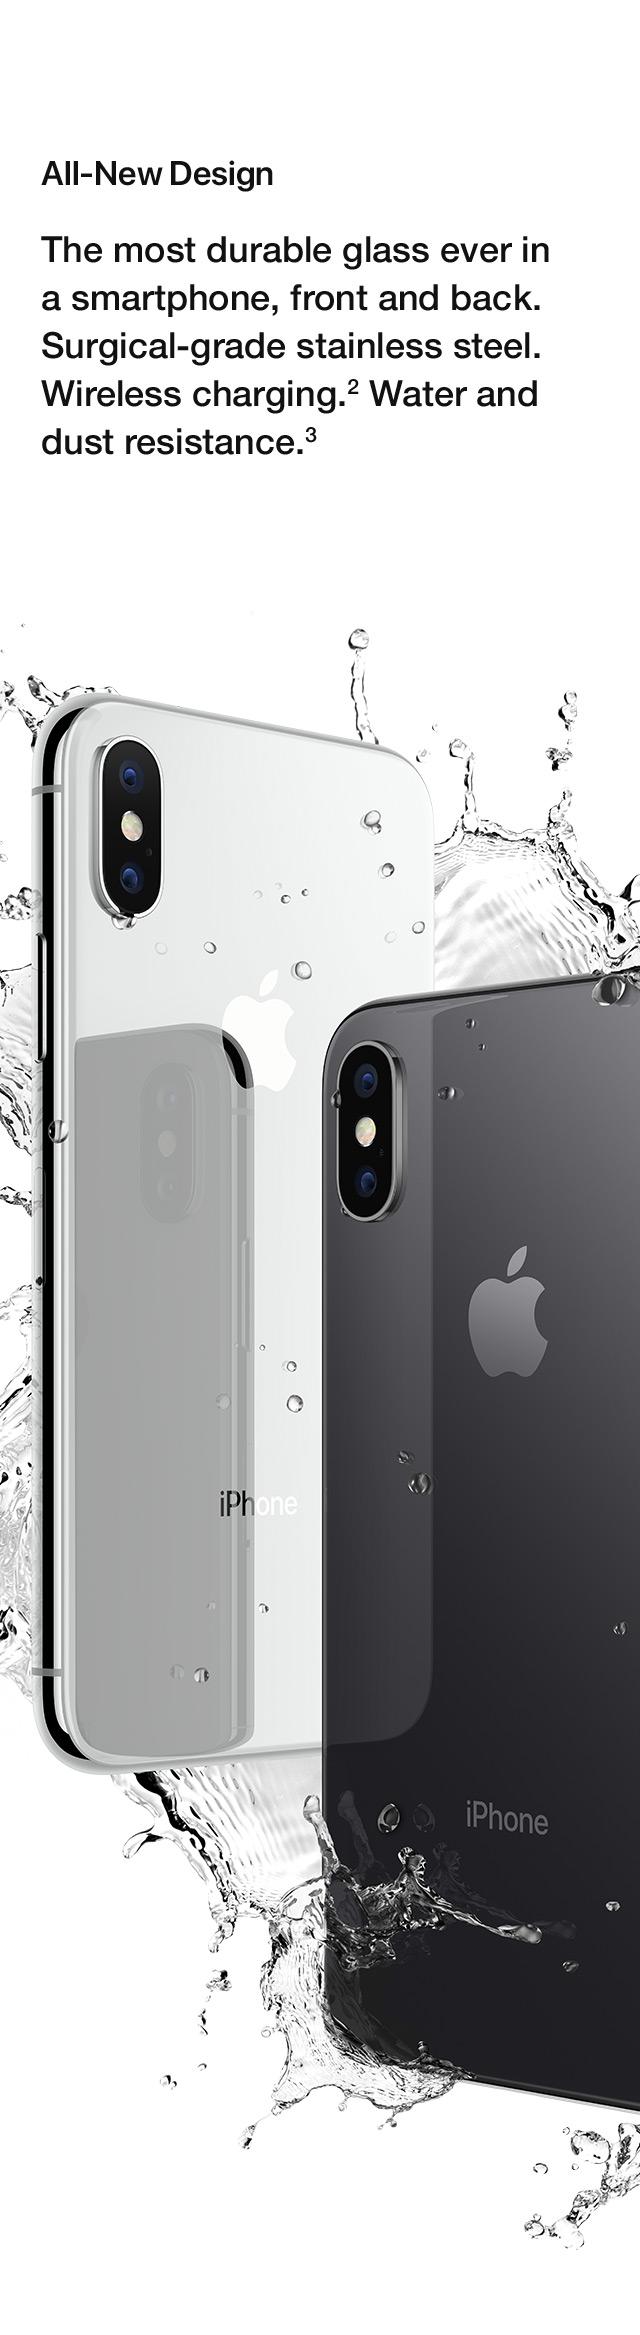 Iphone S Plans Telstra